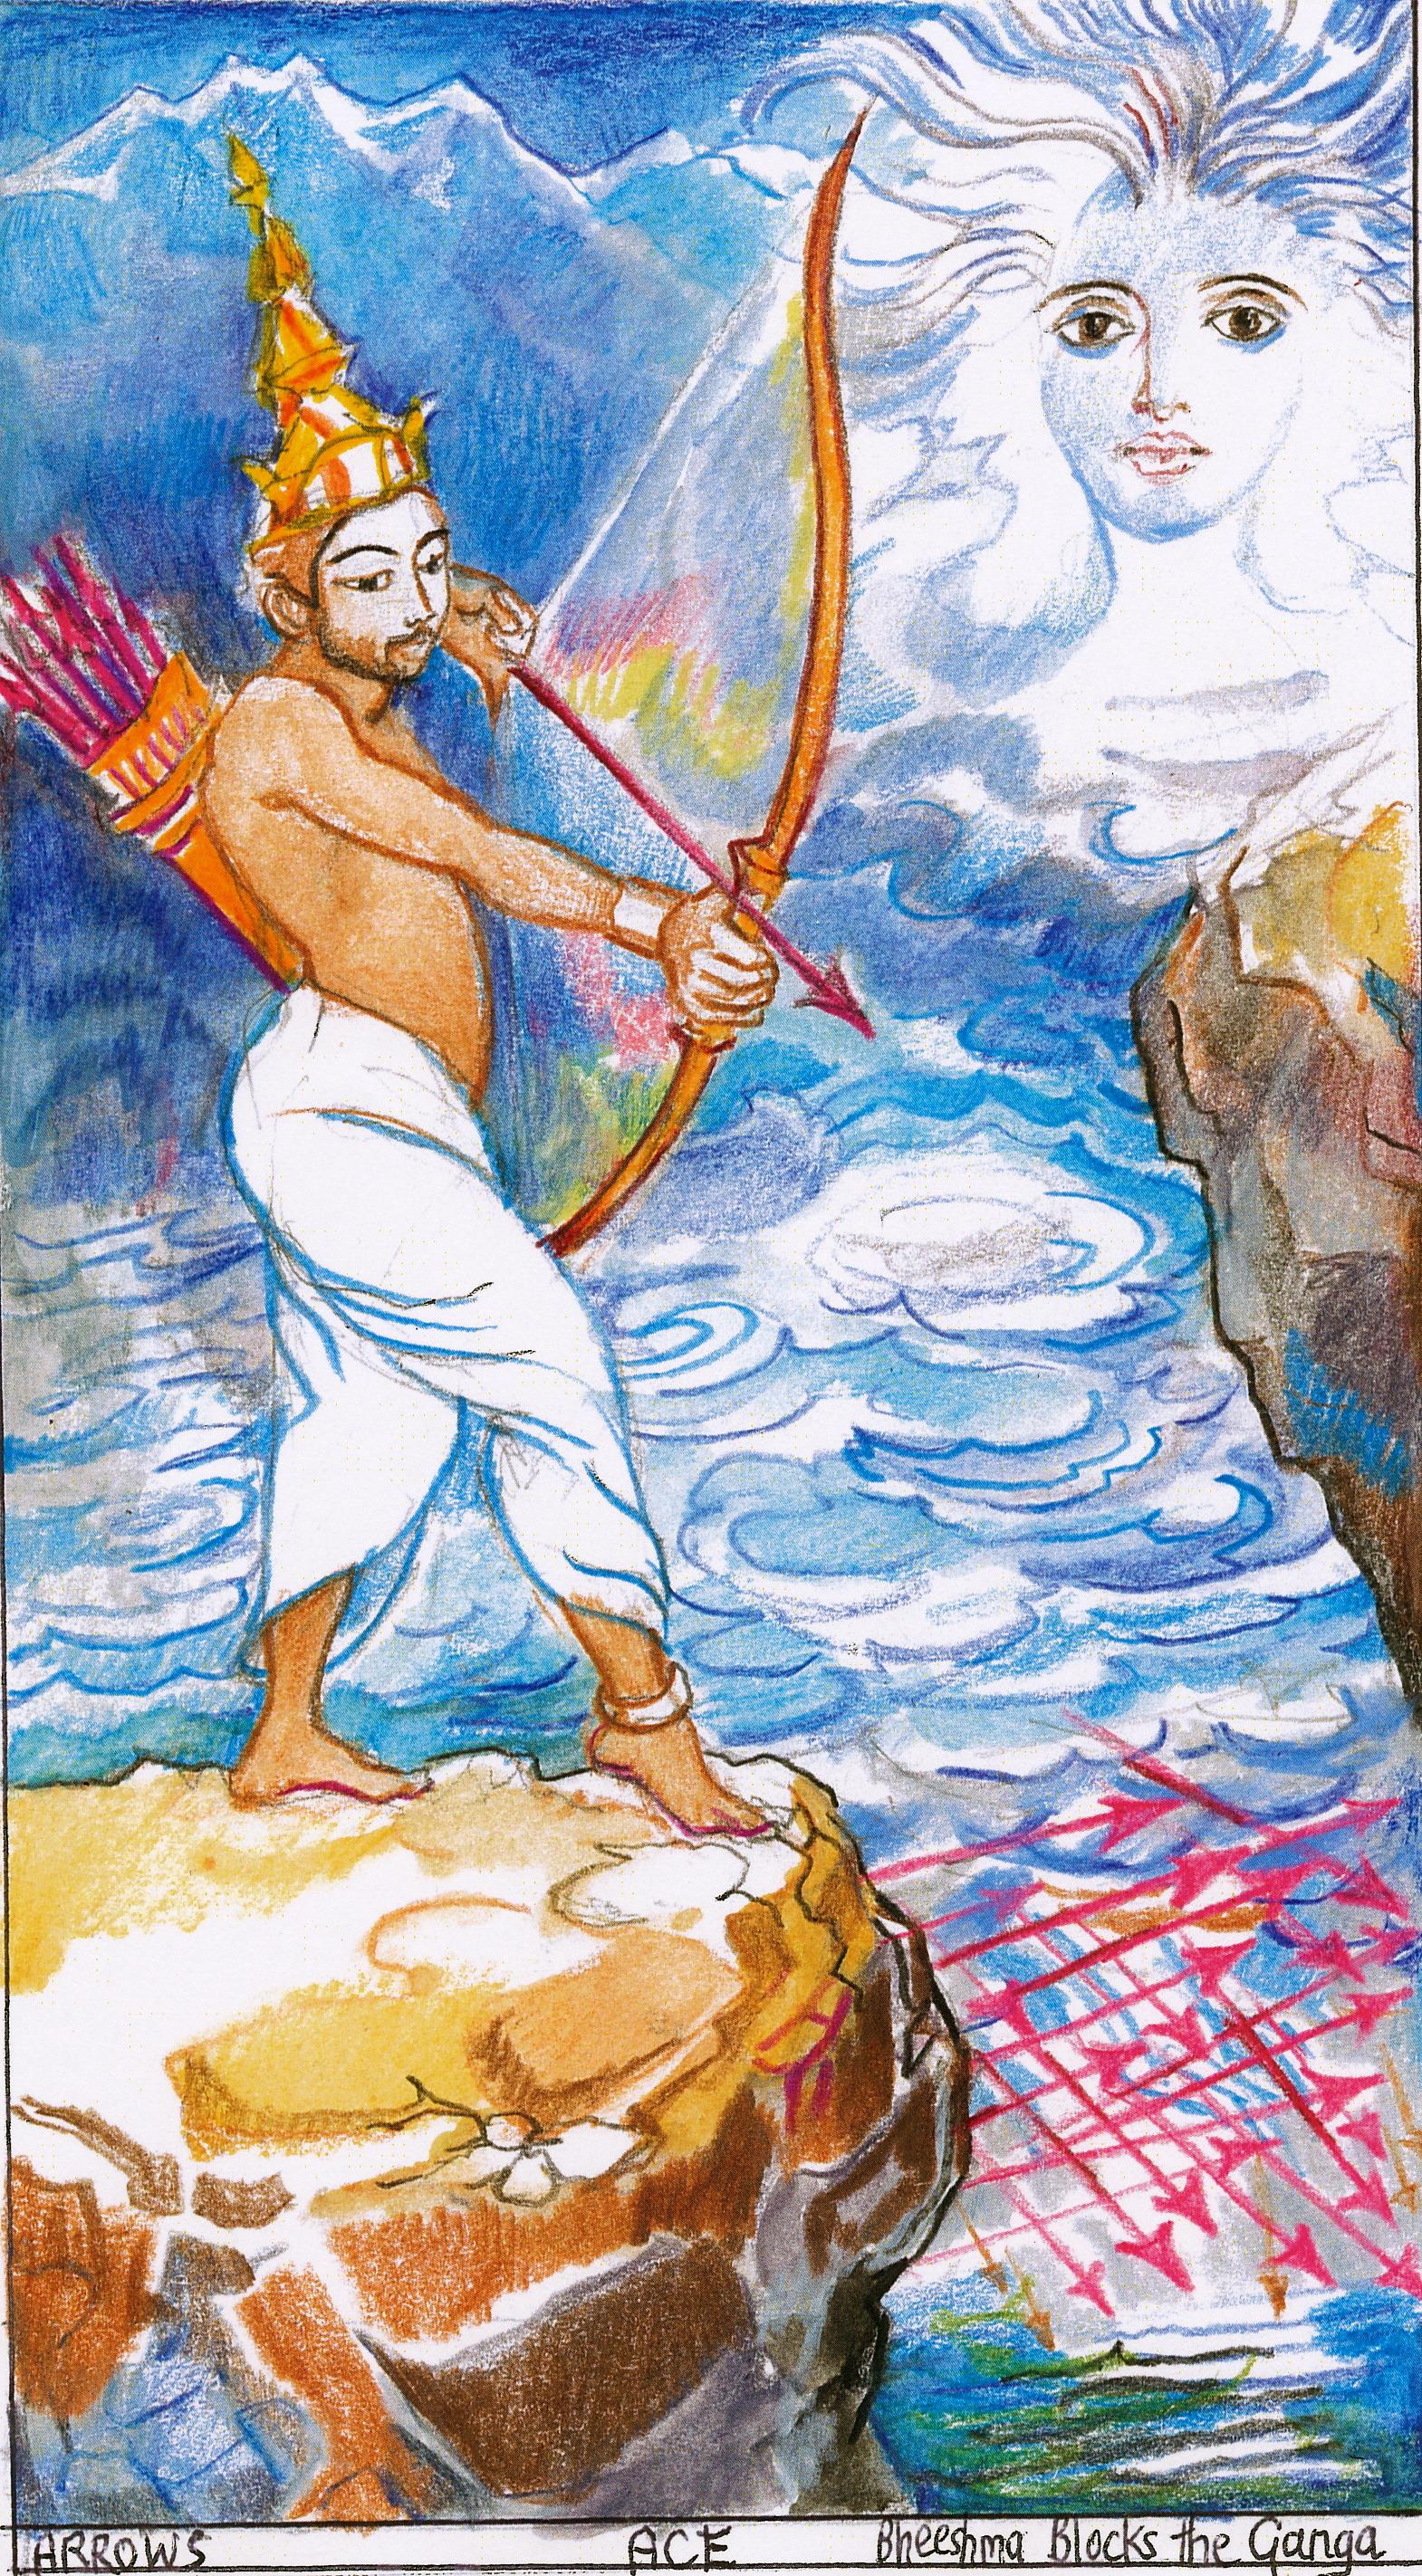 Sita Ace Arrows Bhishma Blocks The Ganga Janeadamsart